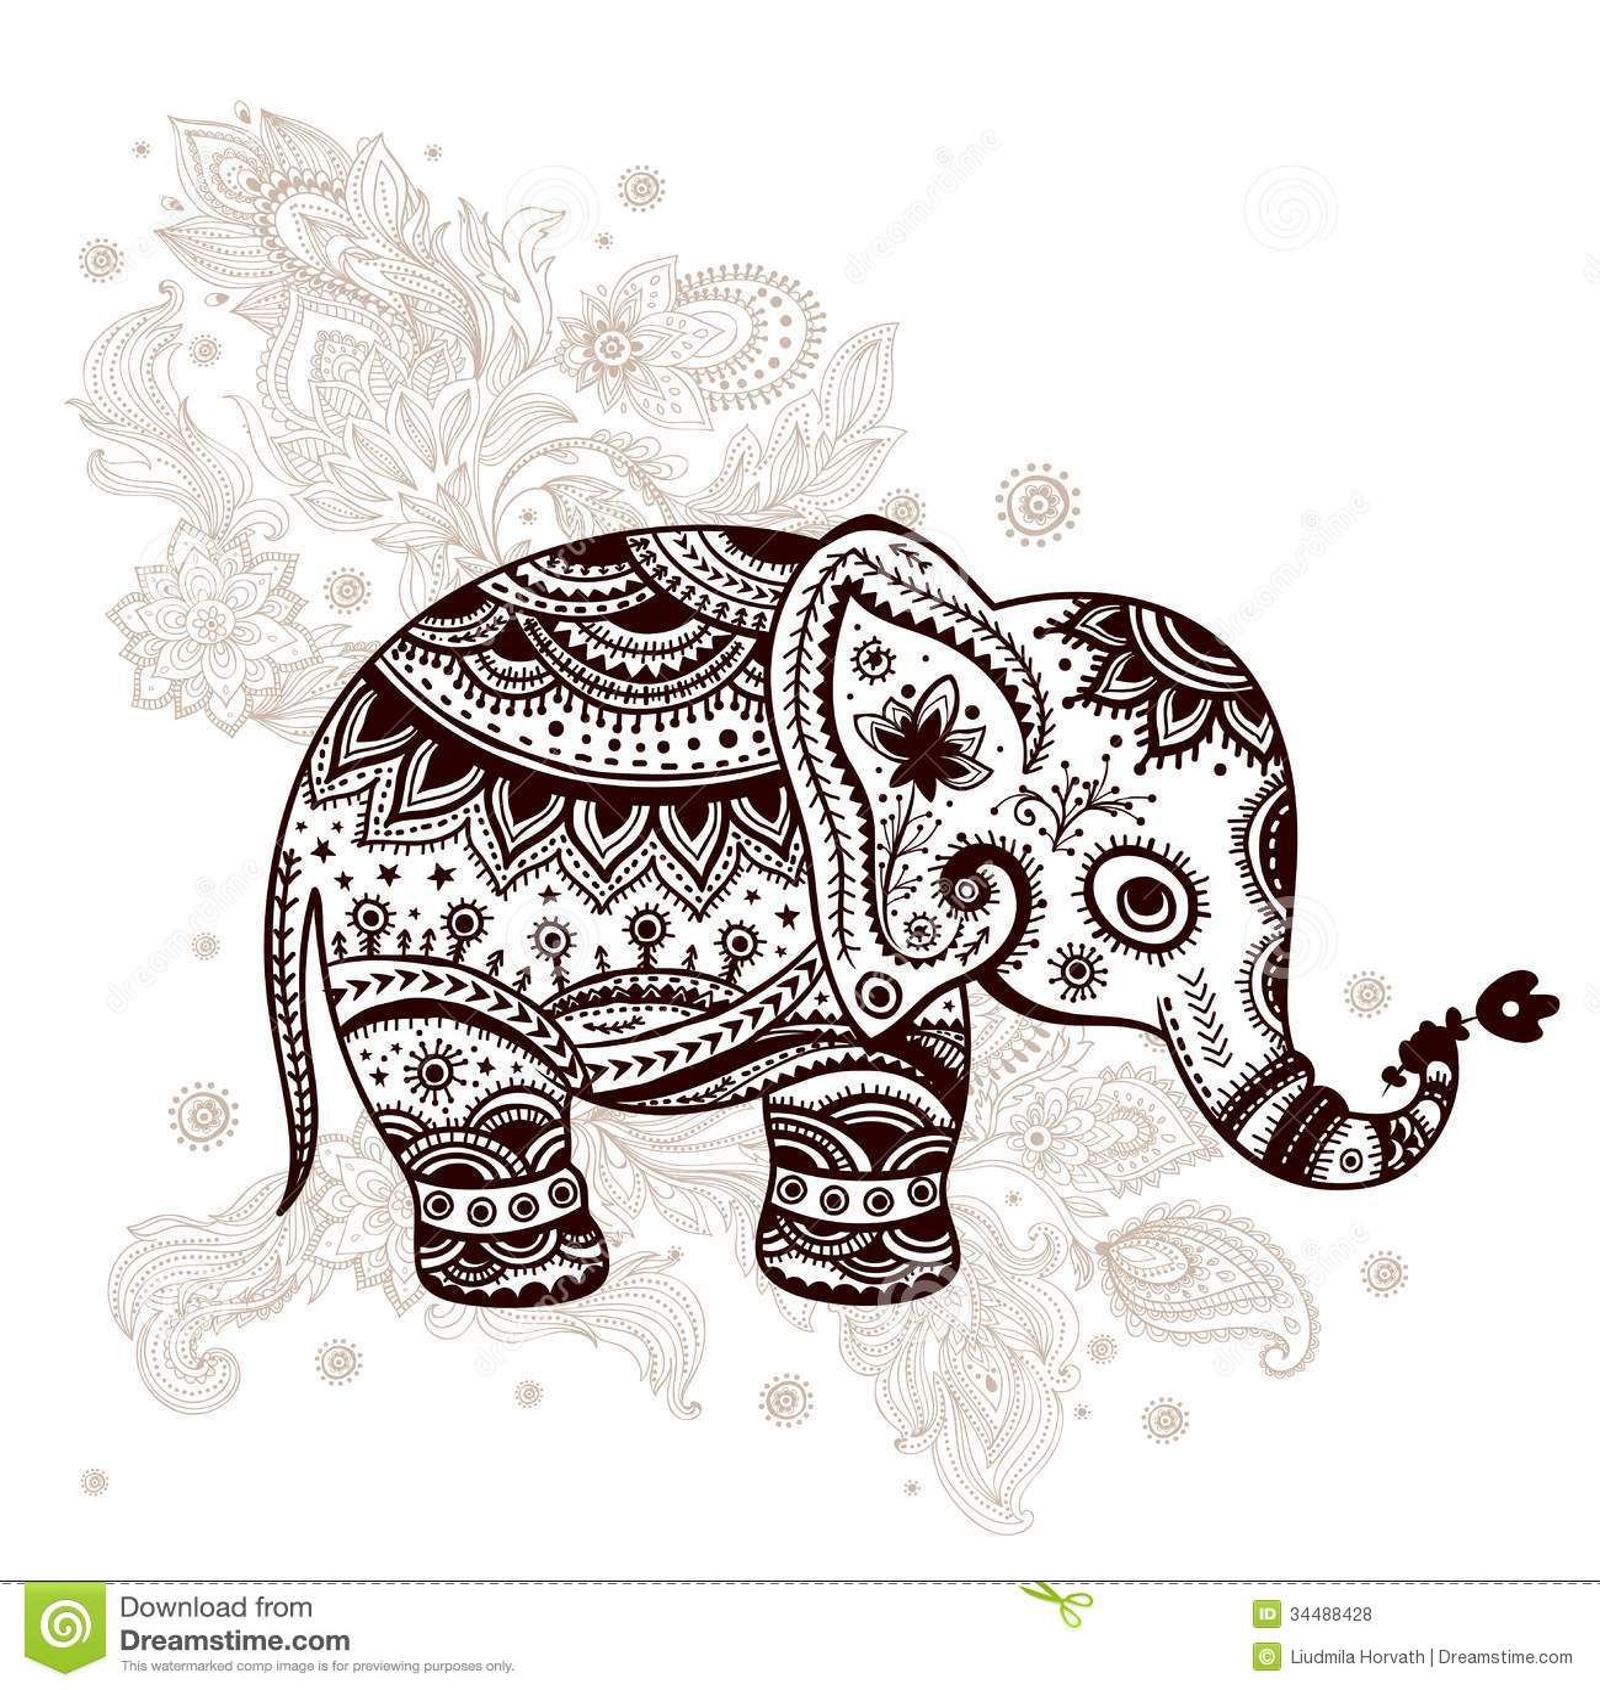 Рисунок слон с узорами